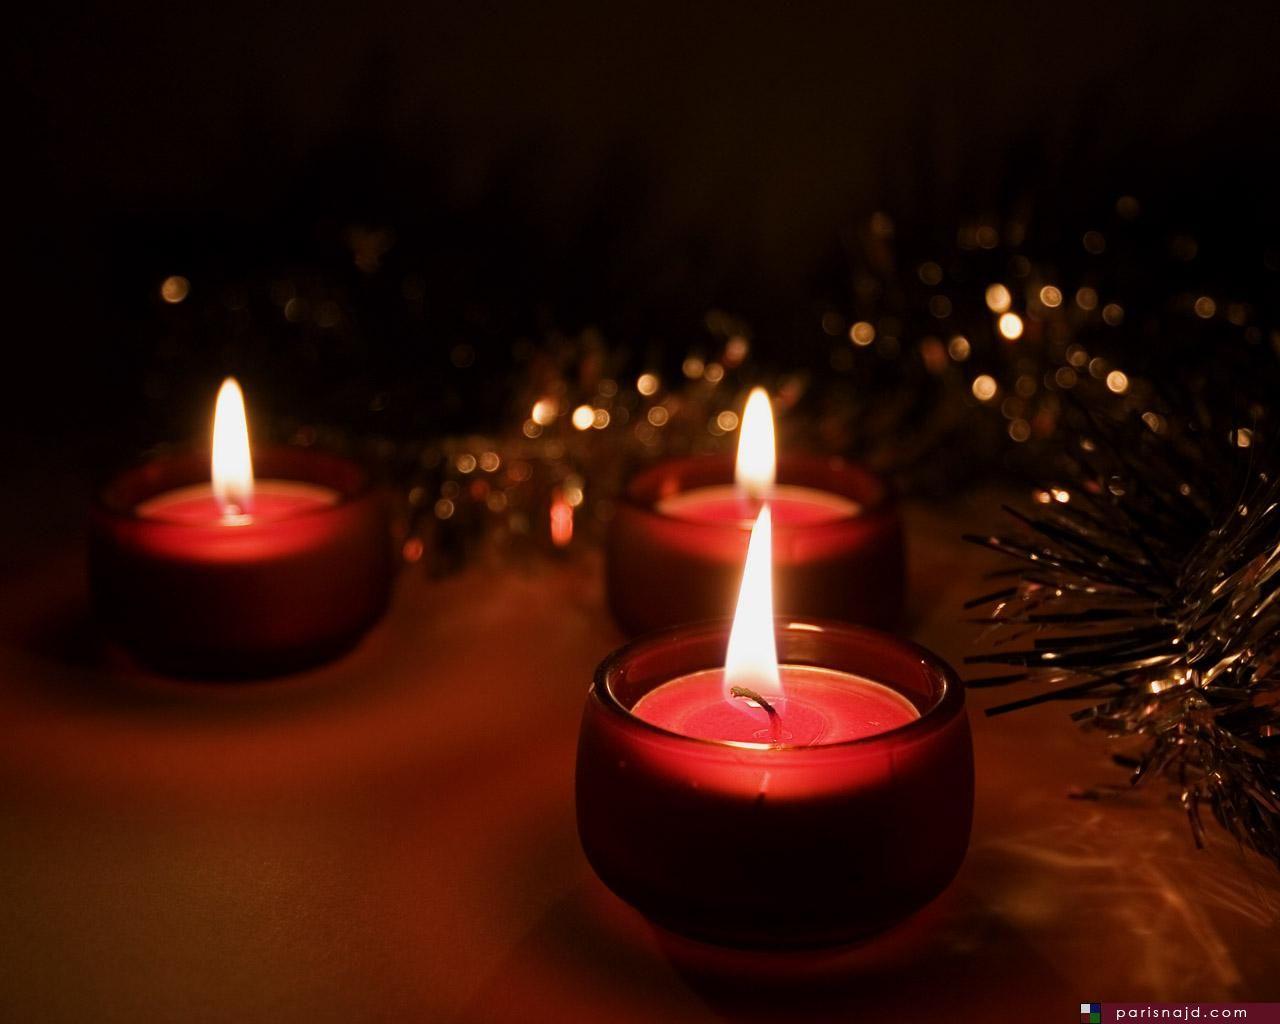 خلفيات شاشة رومانسية Romance Wallpaper Hd 1080p Tecnologis Romantic Candles Candles Candles Wallpaper